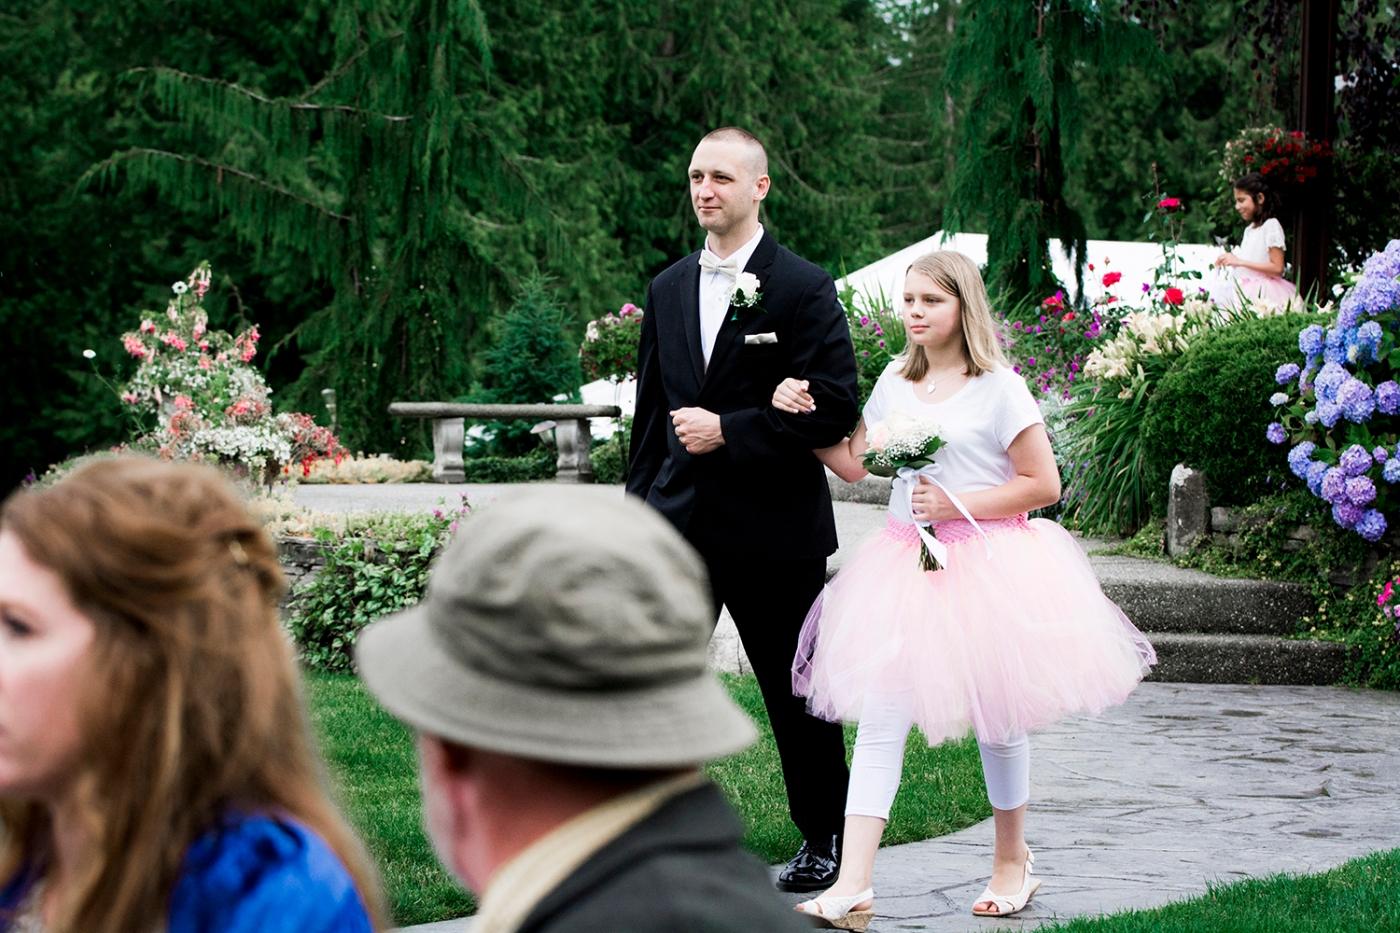 Jane_Speleers_2016_Details_Wedding_Wild_Rose_Estates_Venue_JS7_7738